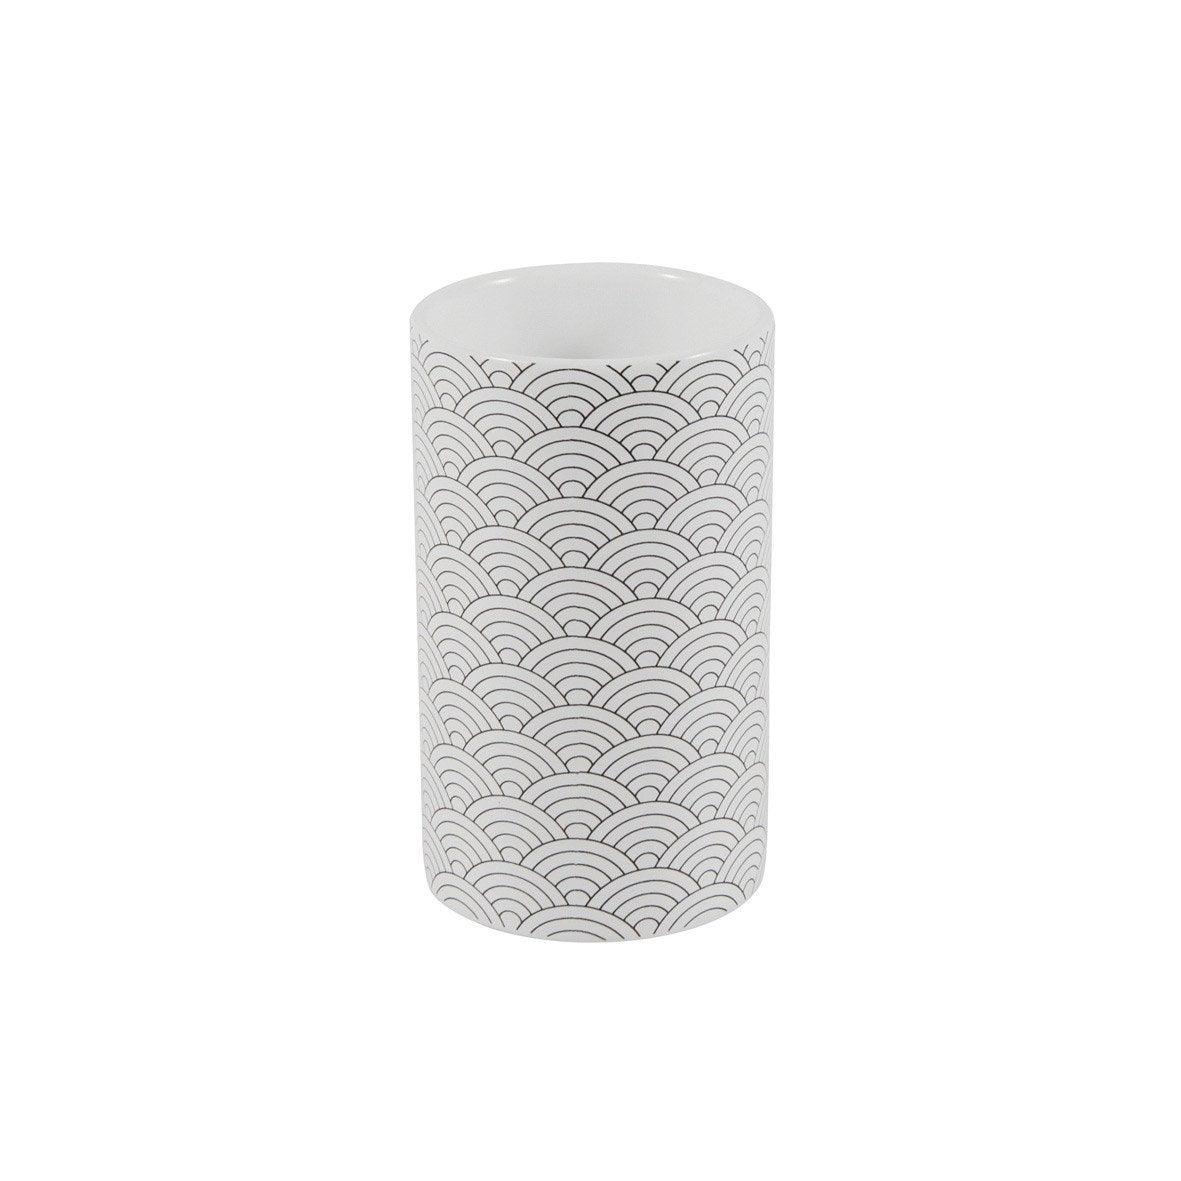 Gobelet céramique Okino, noir et blanc